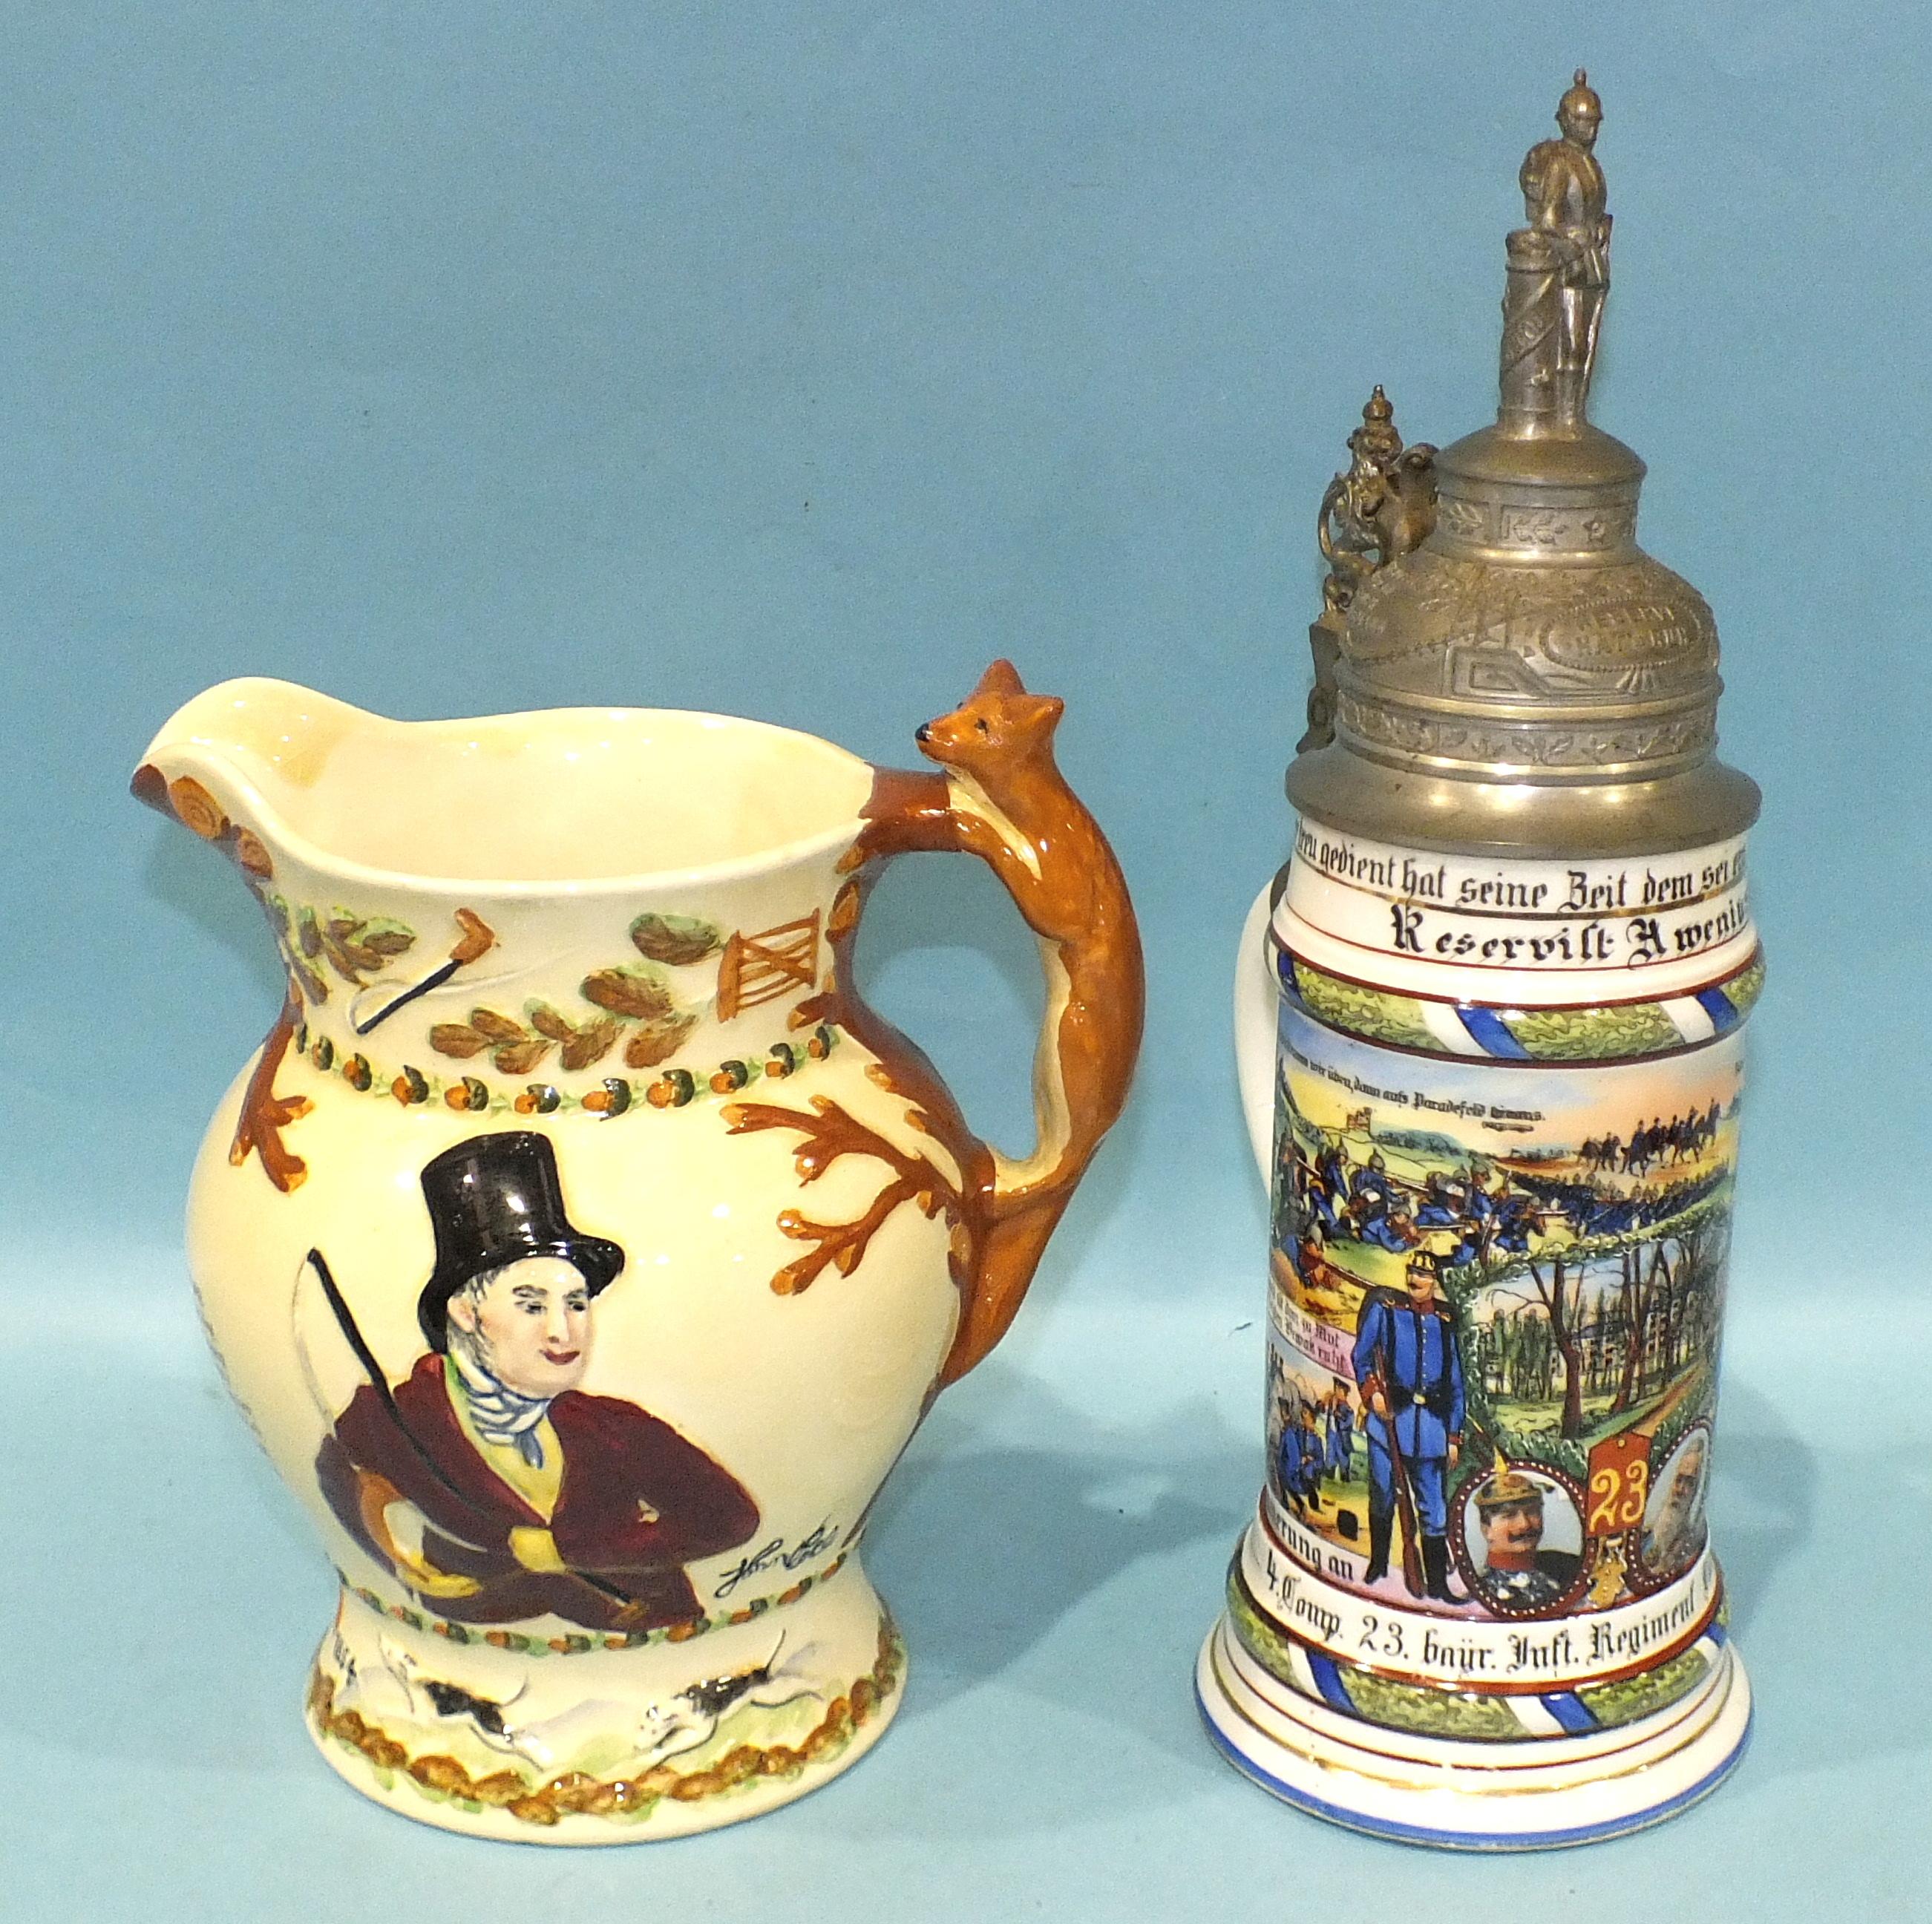 A Crown Devon Fielding 'John Peel' musical jug, 21cm high, (some staining) and a modern German